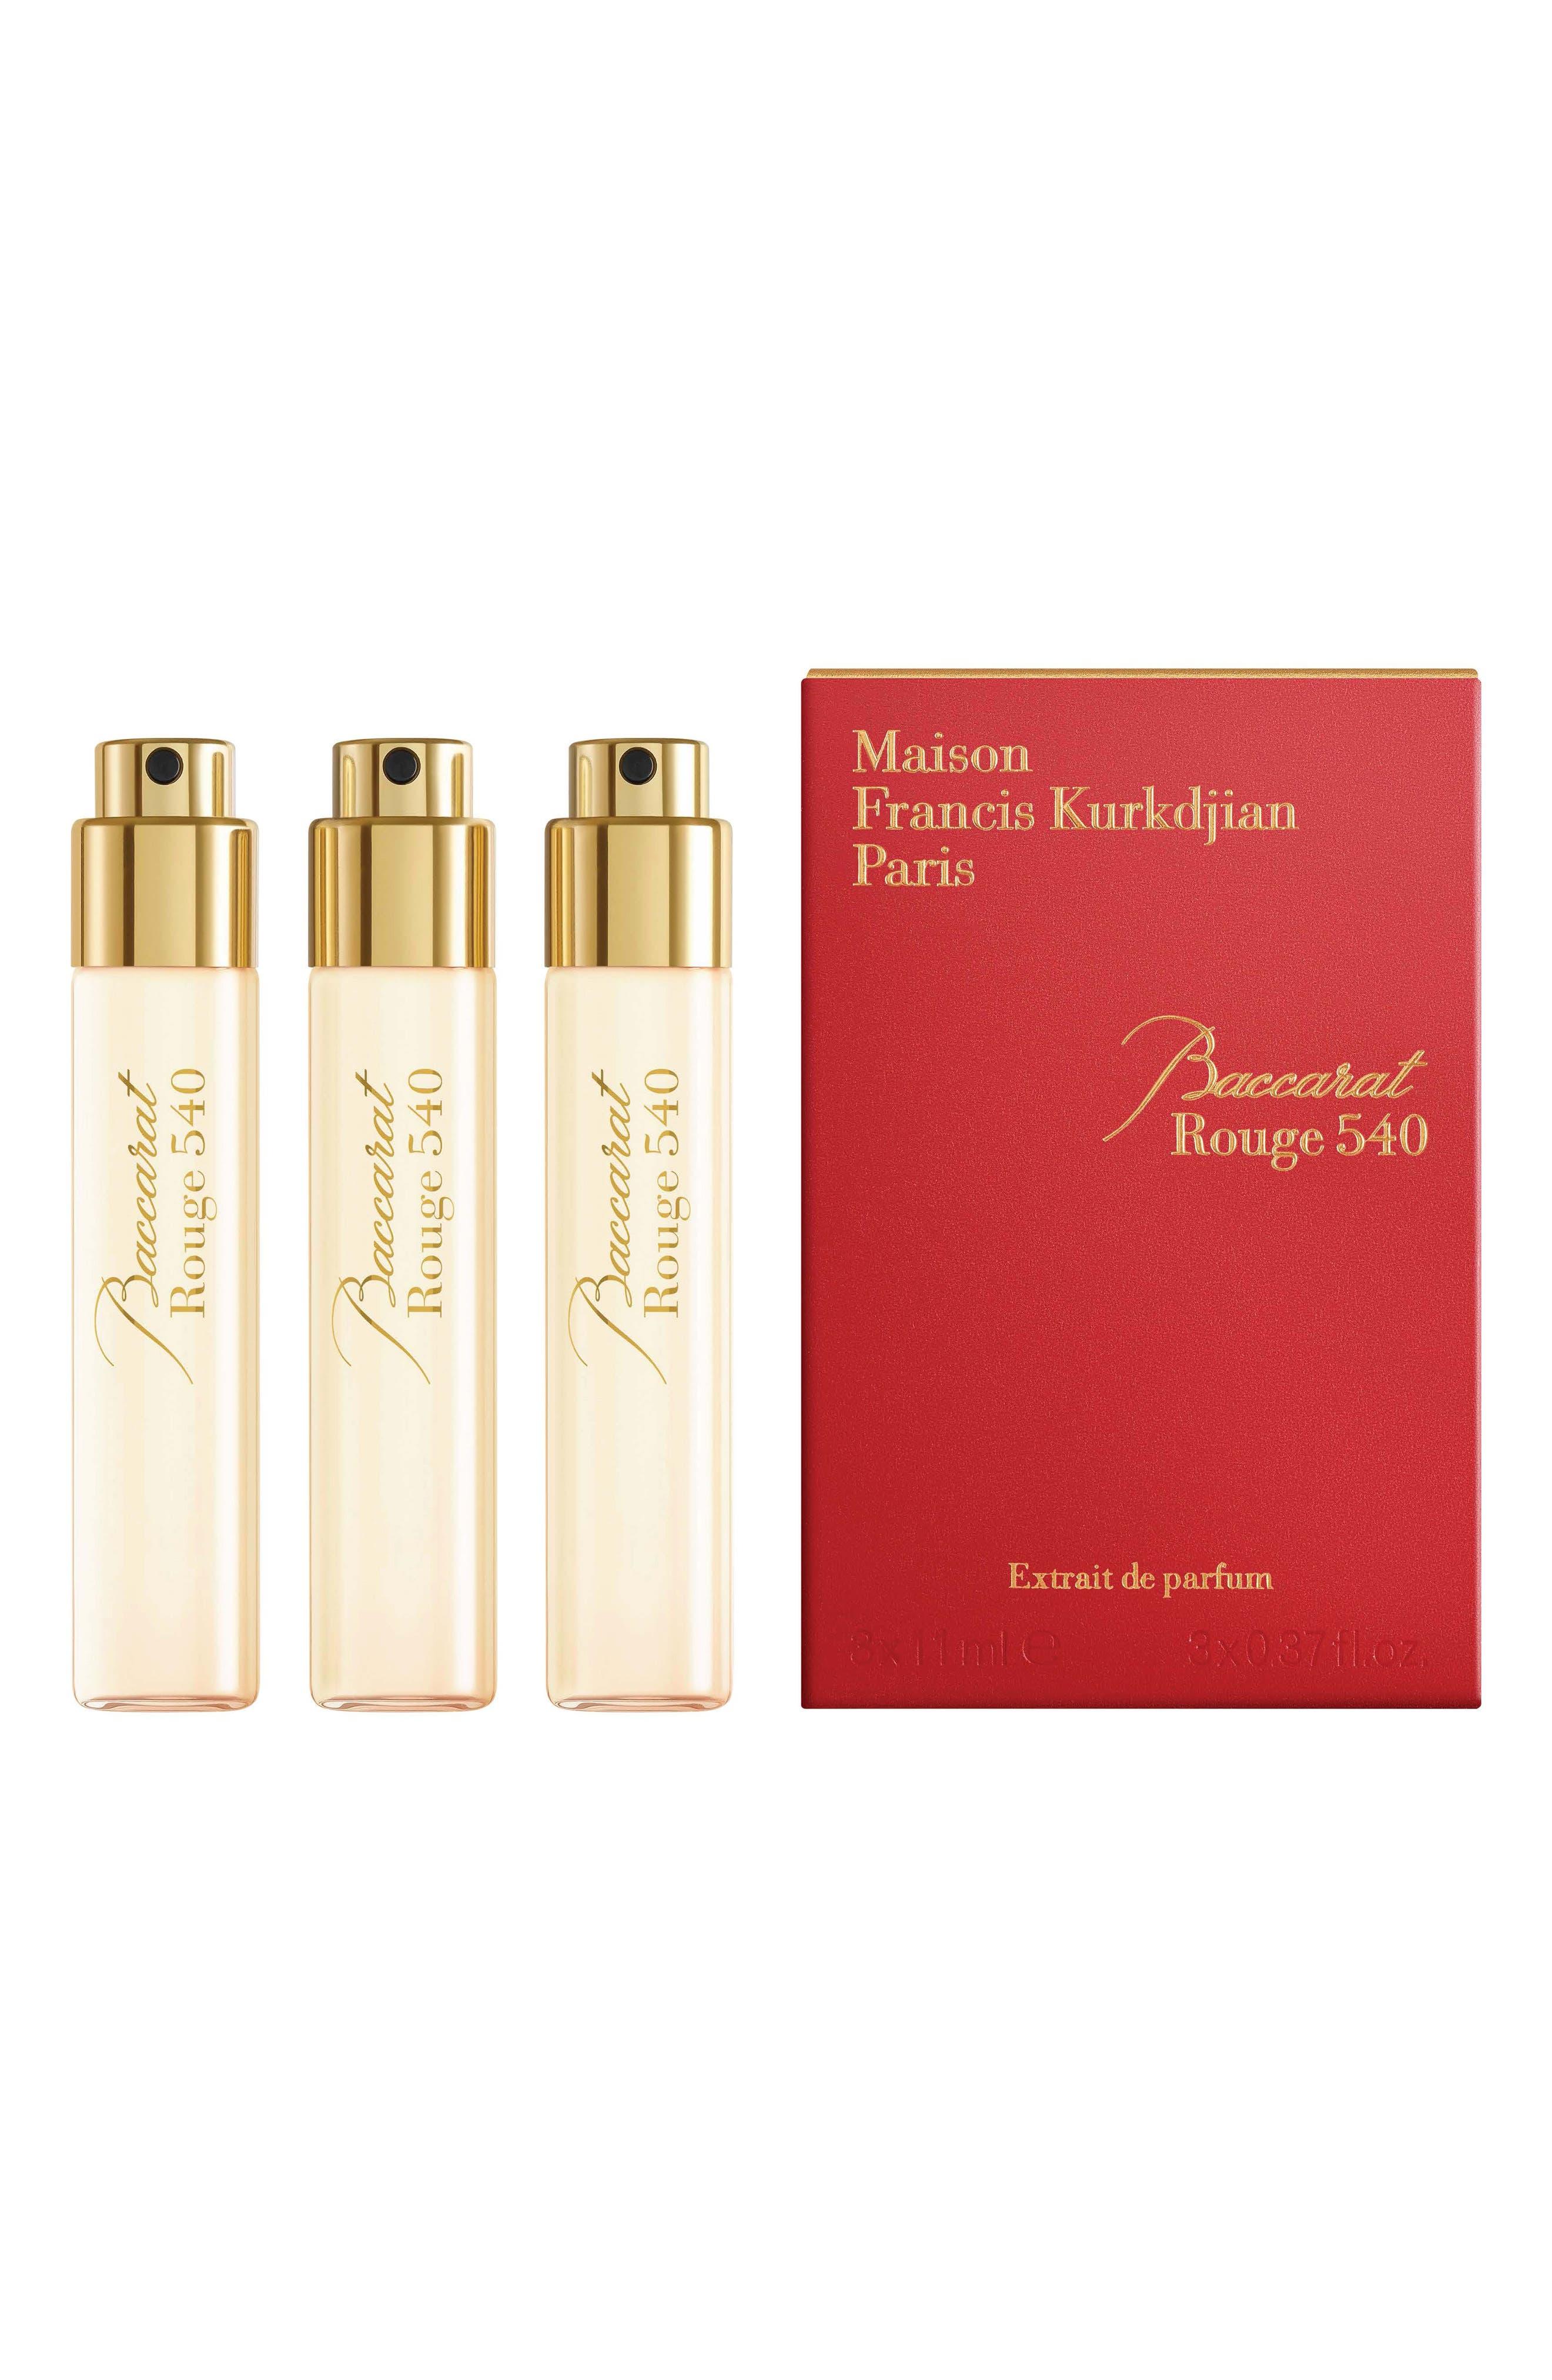 Paris Baccarat Rouge 540 Fragrance Refill Trio